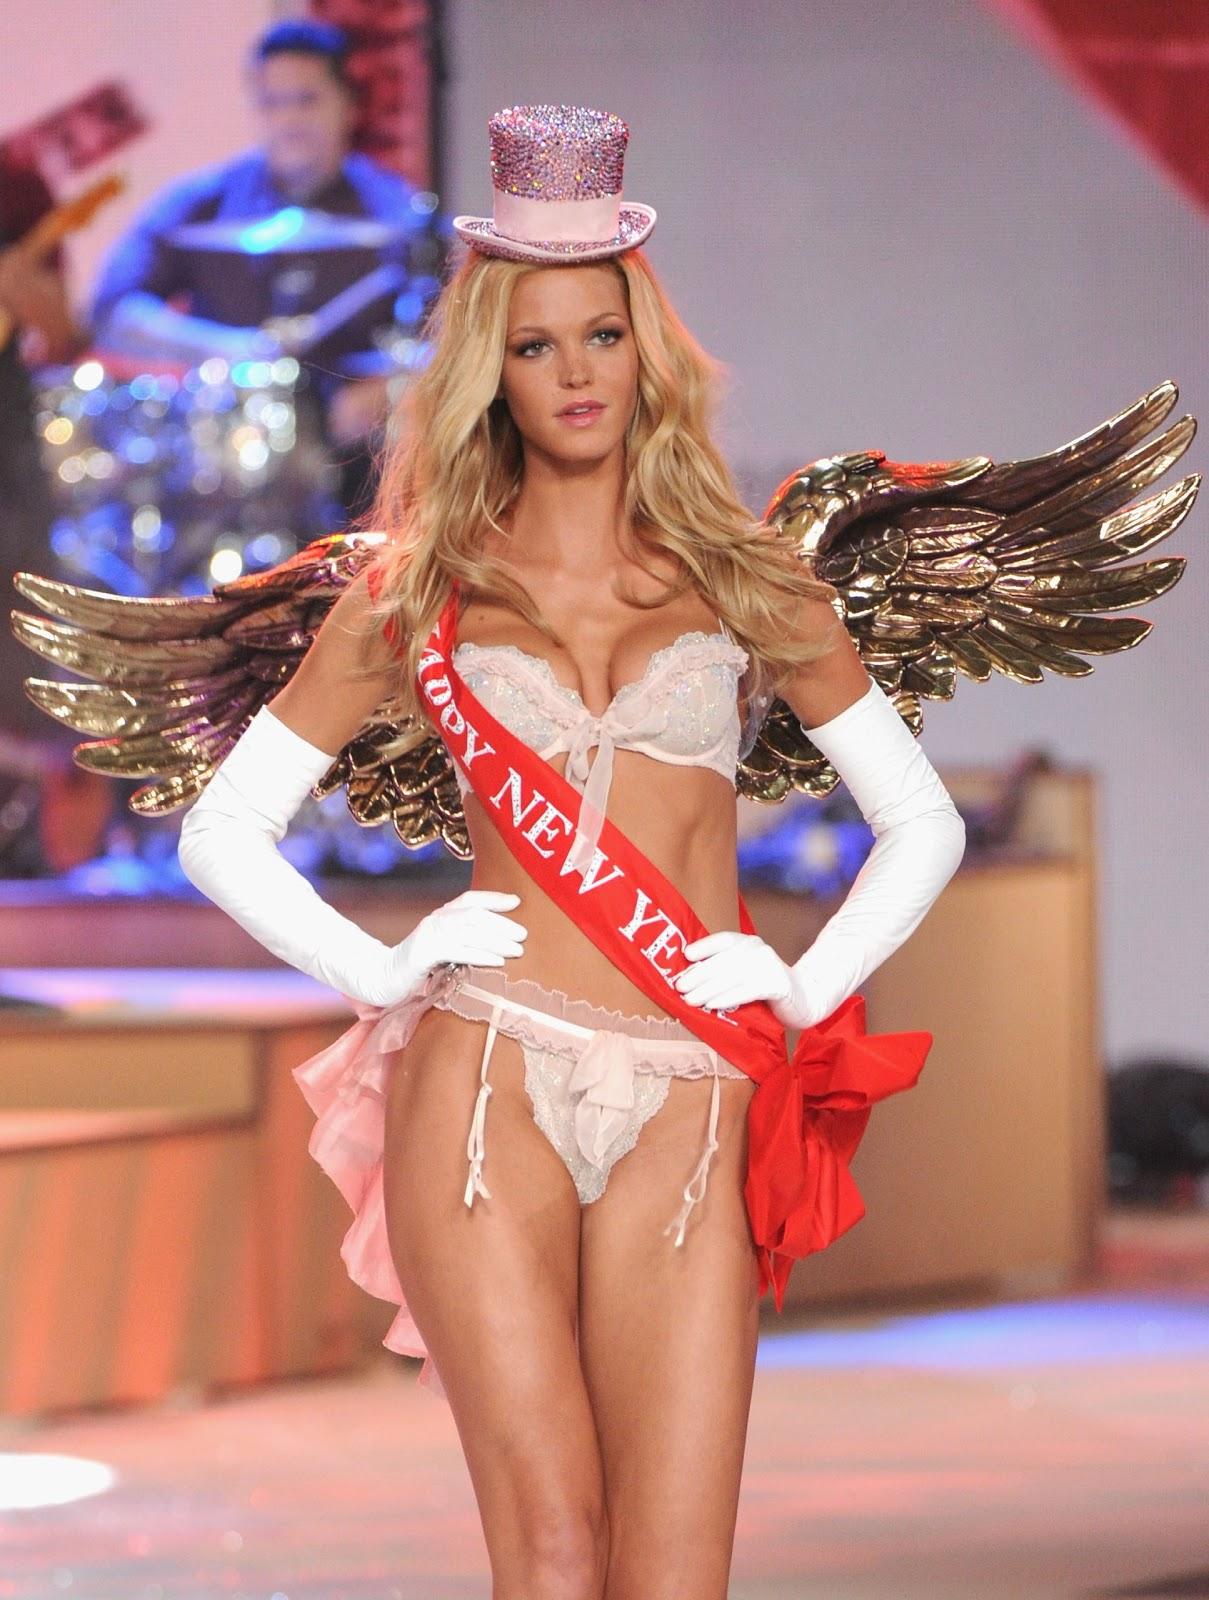 http://4.bp.blogspot.com/-oe2k3vC9qrY/UJu-BPoL_YI/AAAAAAAAETs/AGE2YXfjez4/s1600/Erin+Heatherton+Victoria%27s+Secret+Fashion+Show+Runway+in+NewYork+7+November+2012+%282%29.jpg